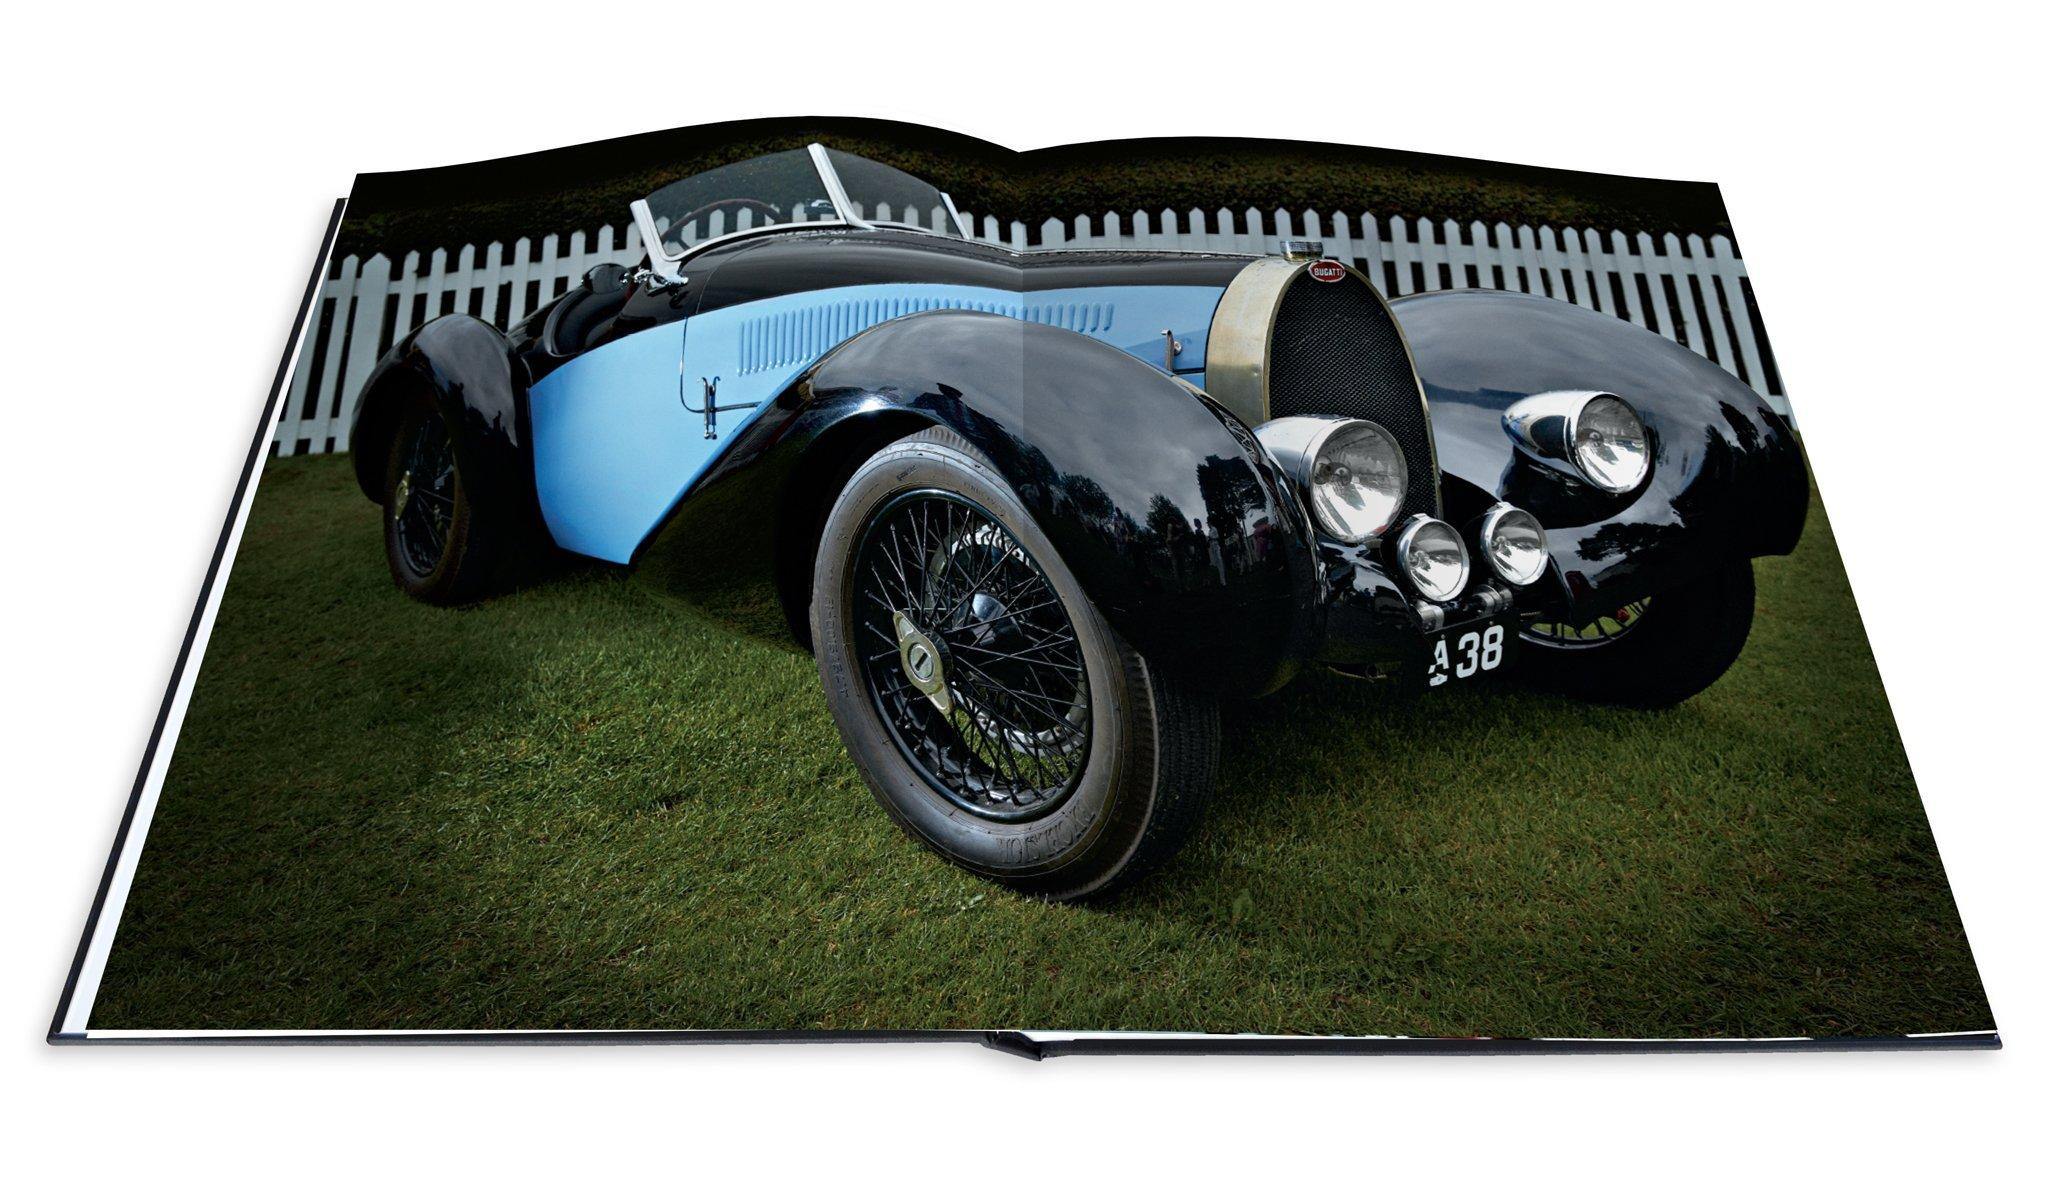 Vintage-cars-inside6_2048x.jpg